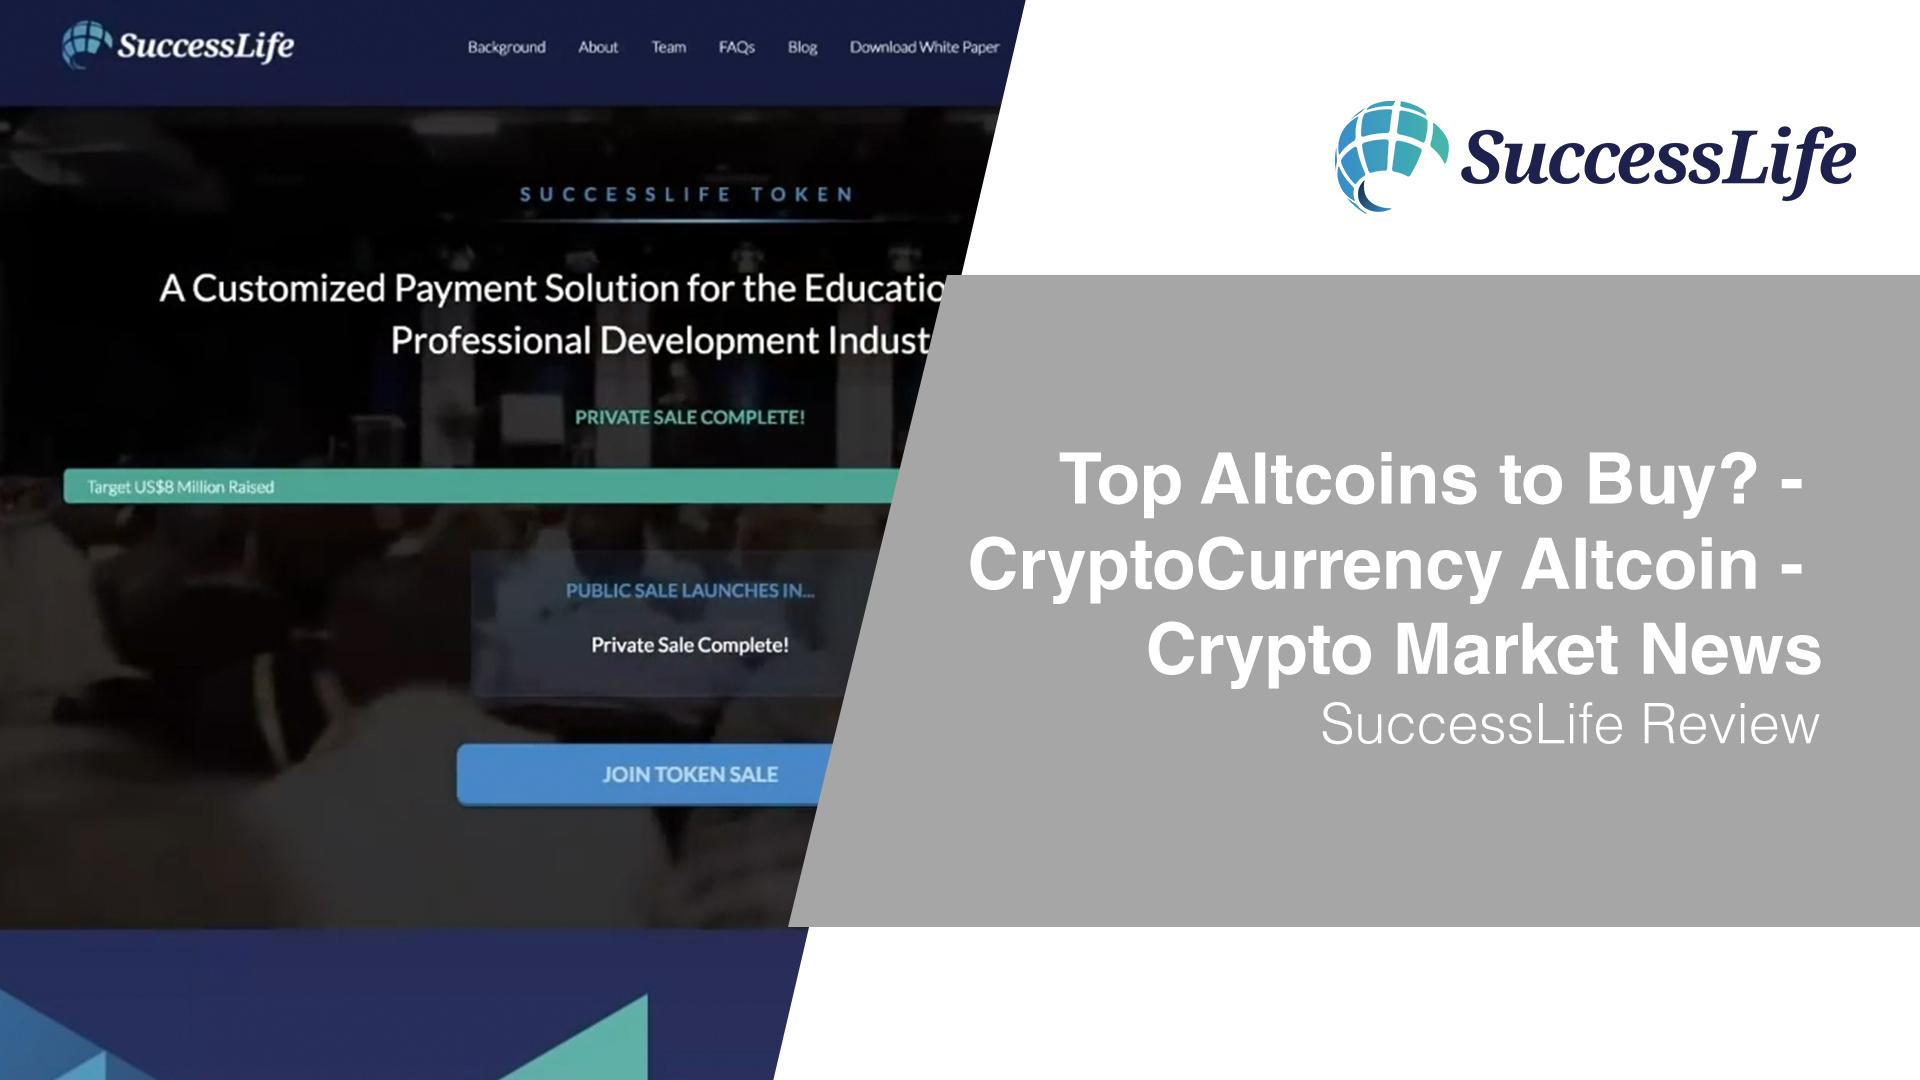 crypto-market-news-review